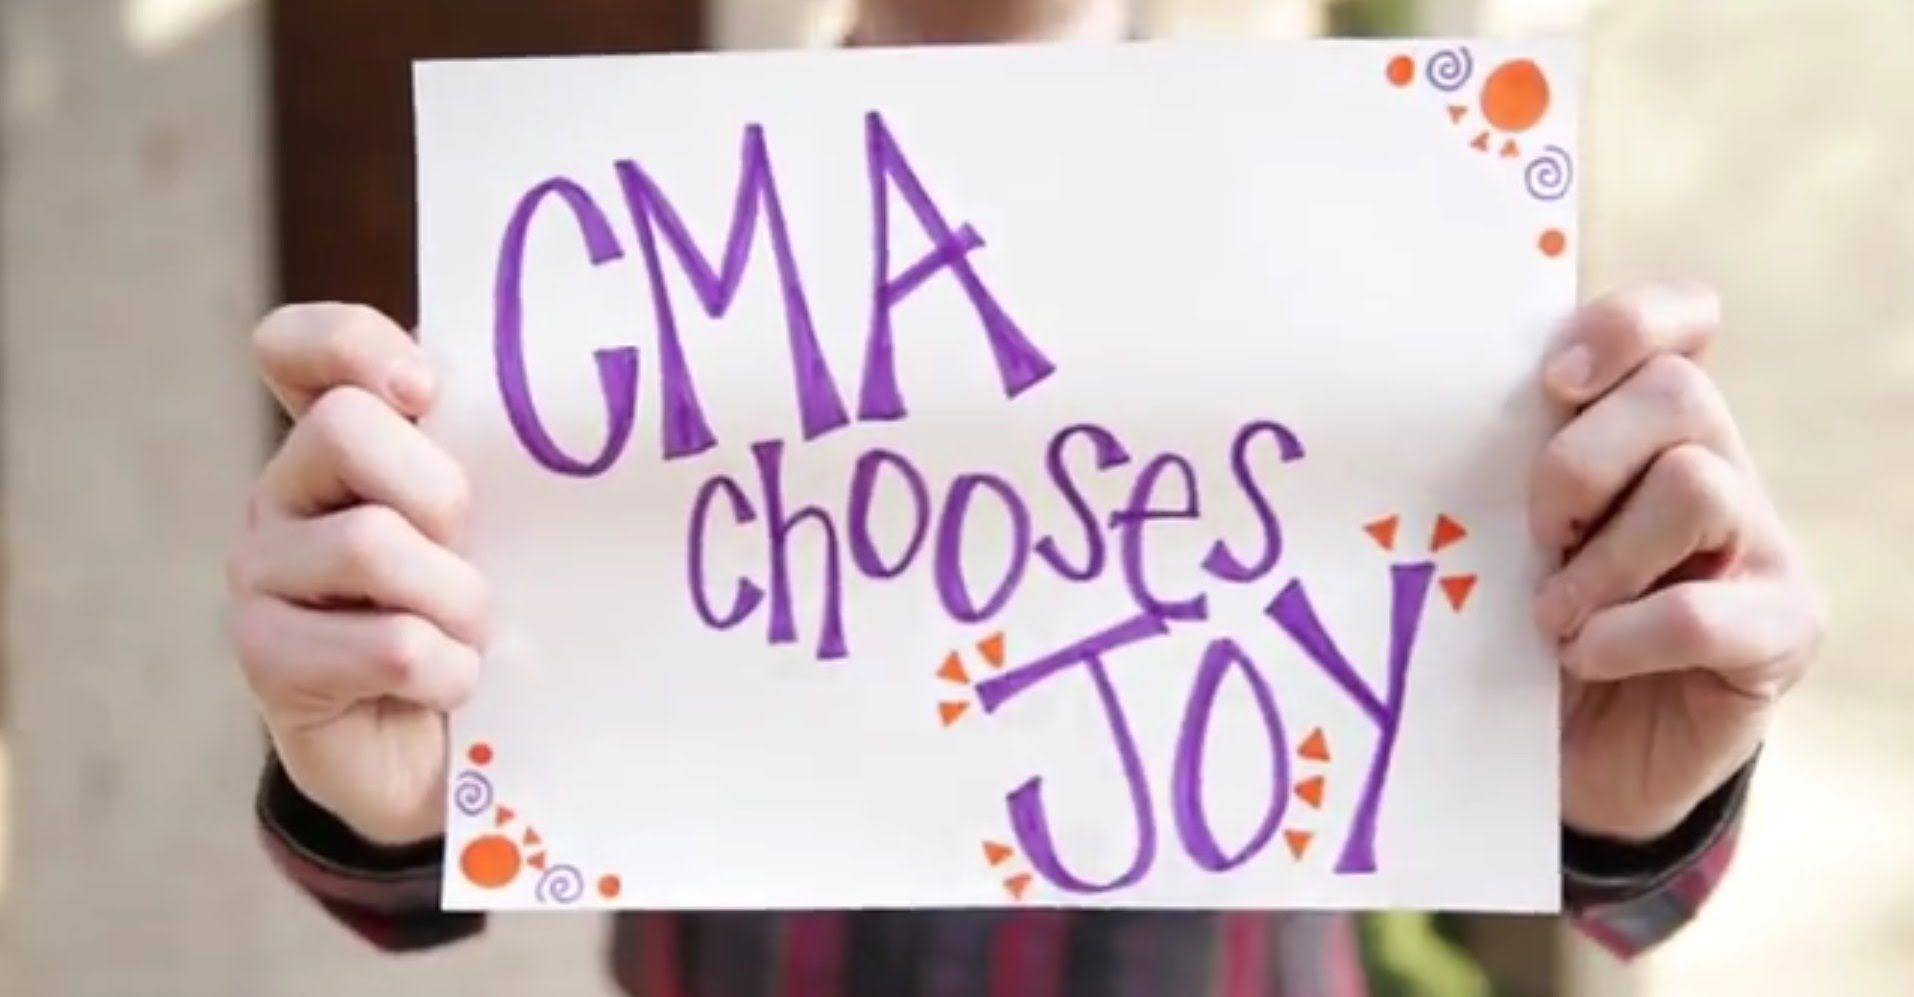 Cma celebrates pimpin joy week with the bobby bones show